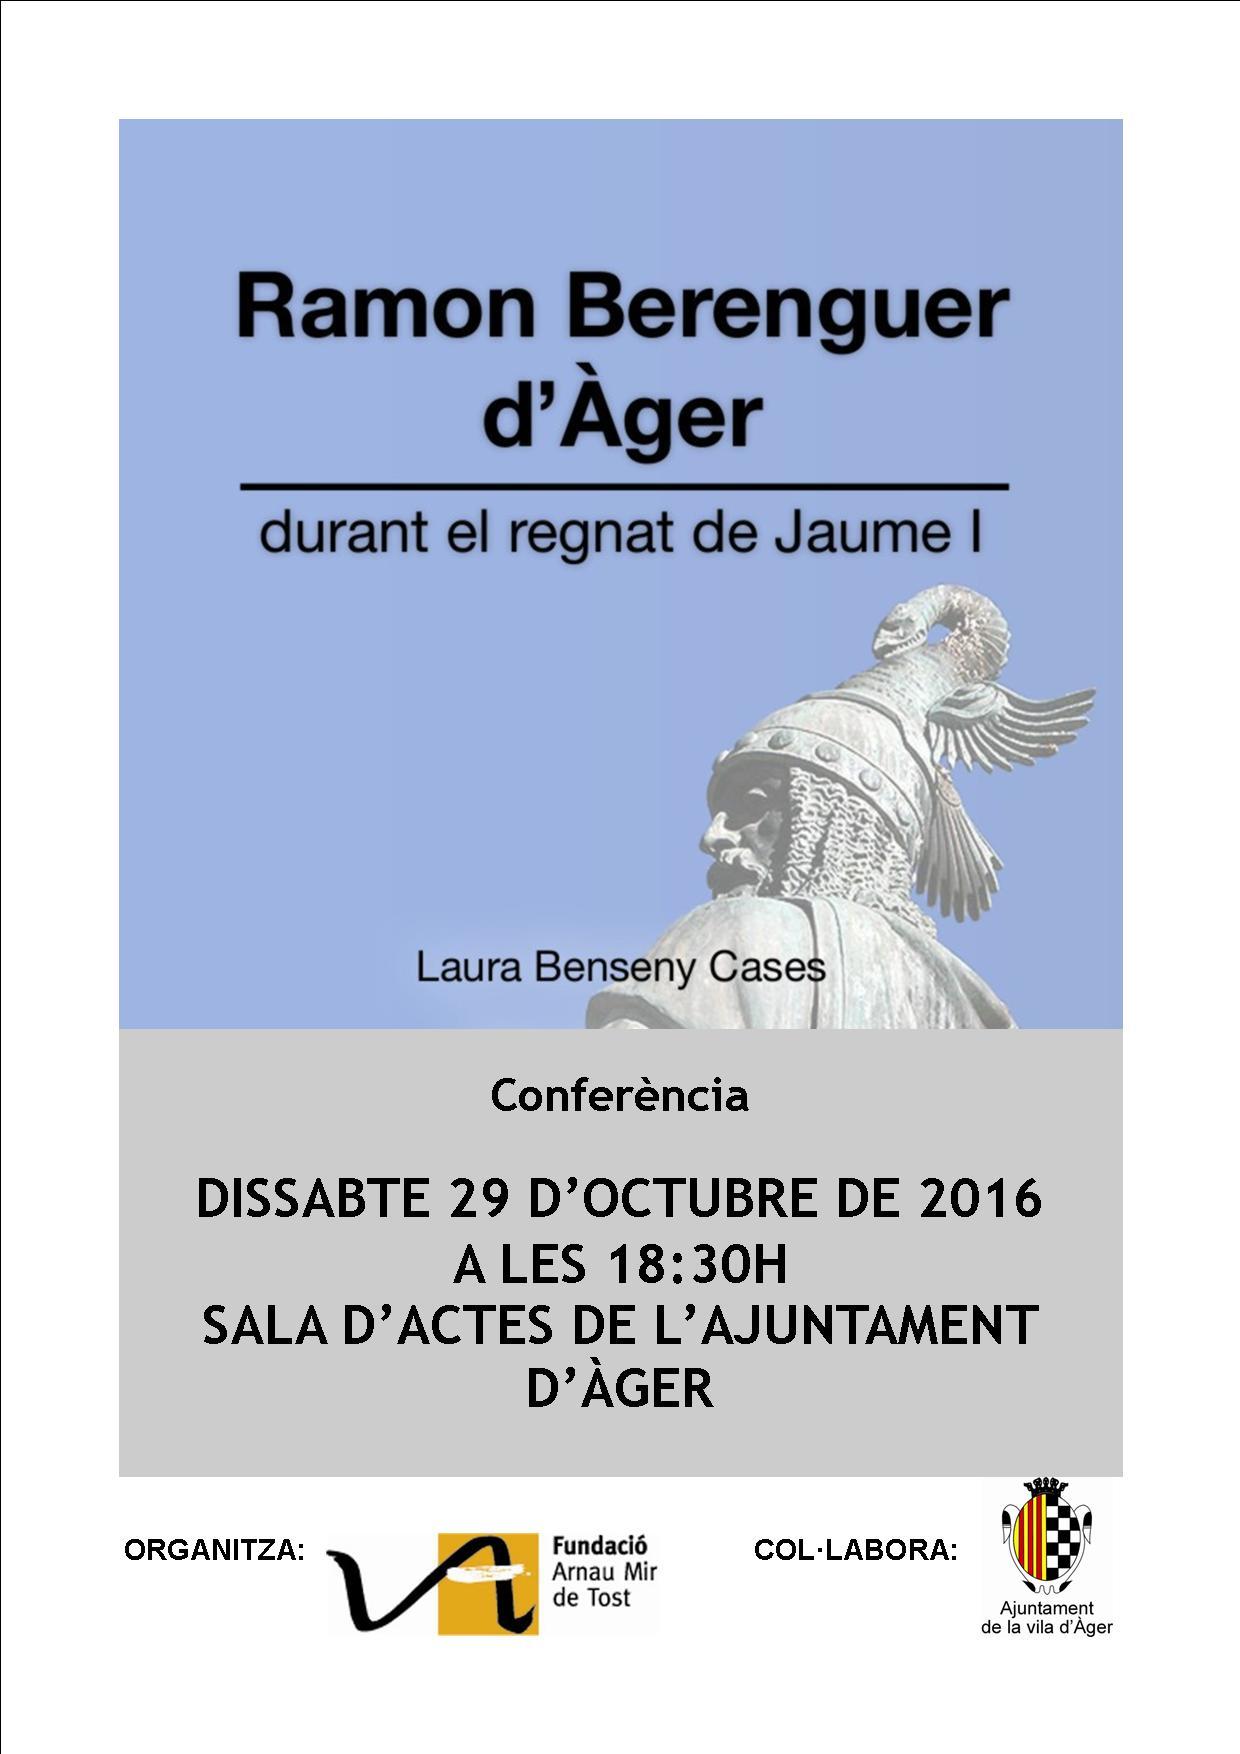 Ramon Berenguer